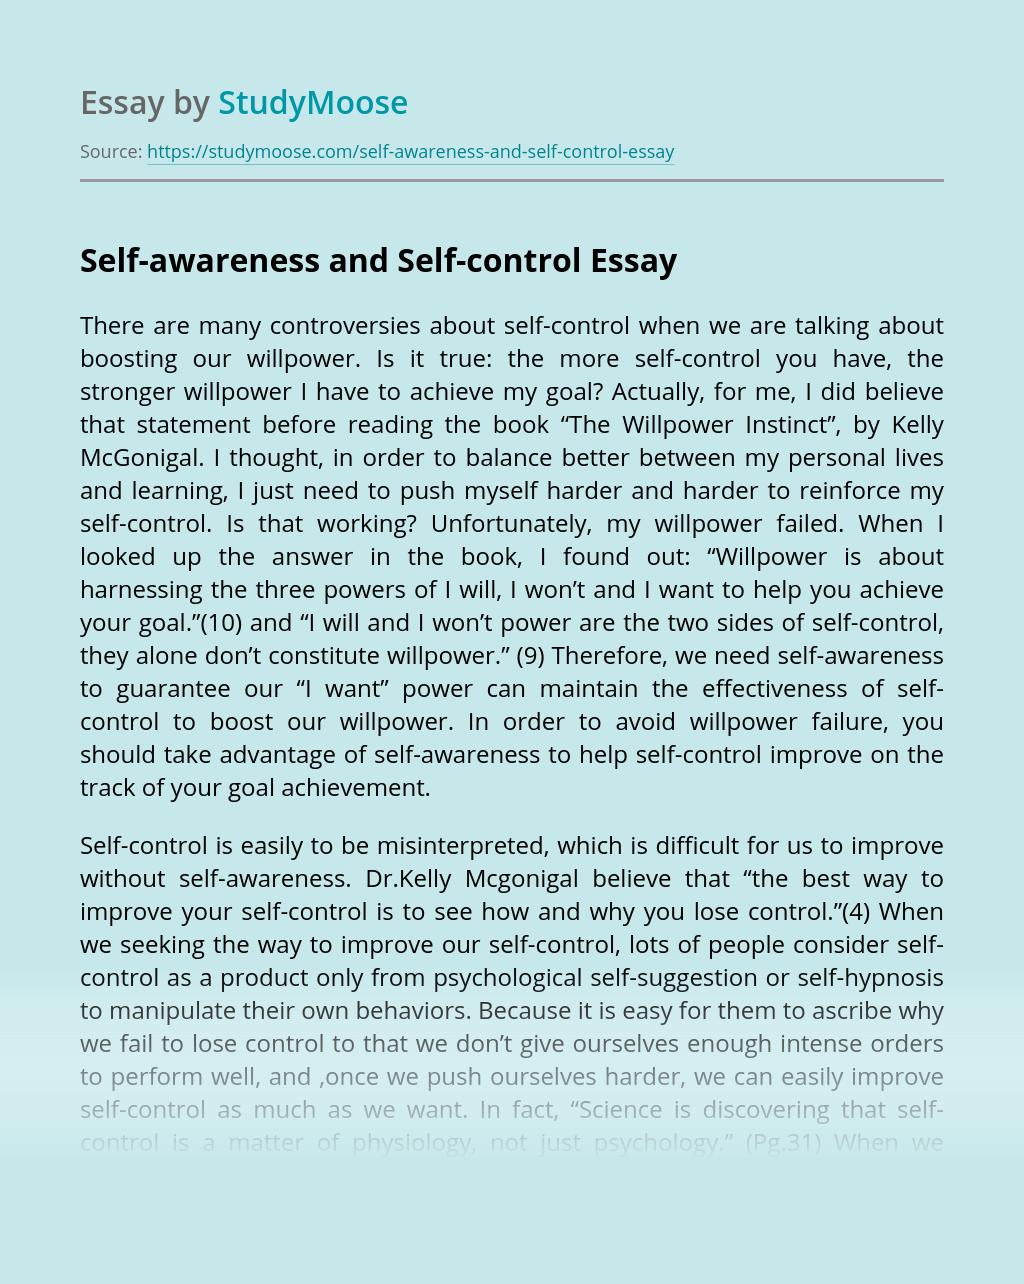 Self-awareness and Self-control